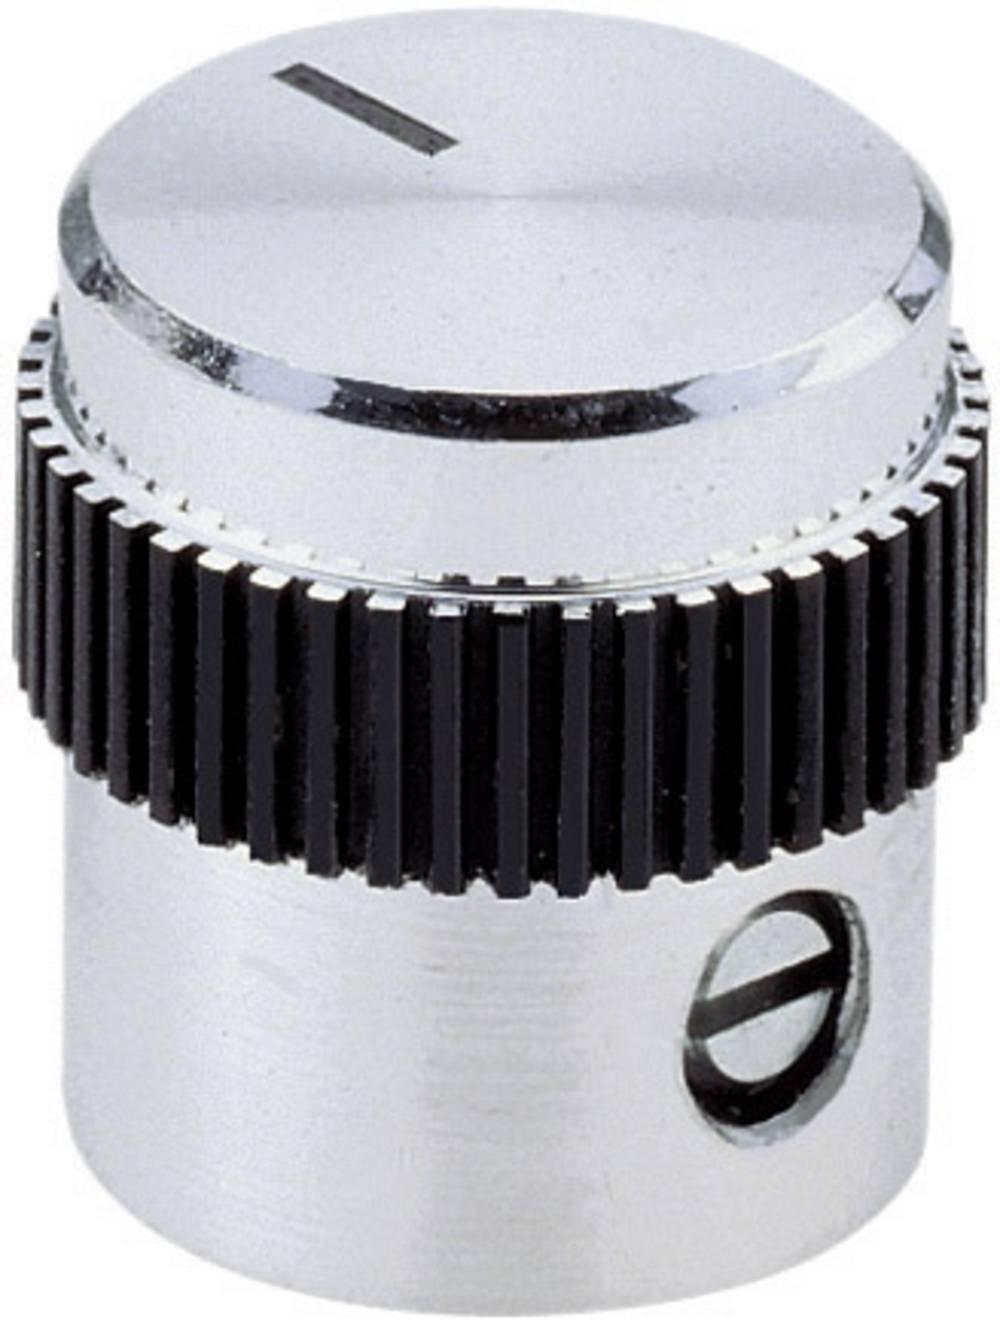 Mentor aluminijast gumb s plastičnim uložkom promjer osi 4mm 5615.4614